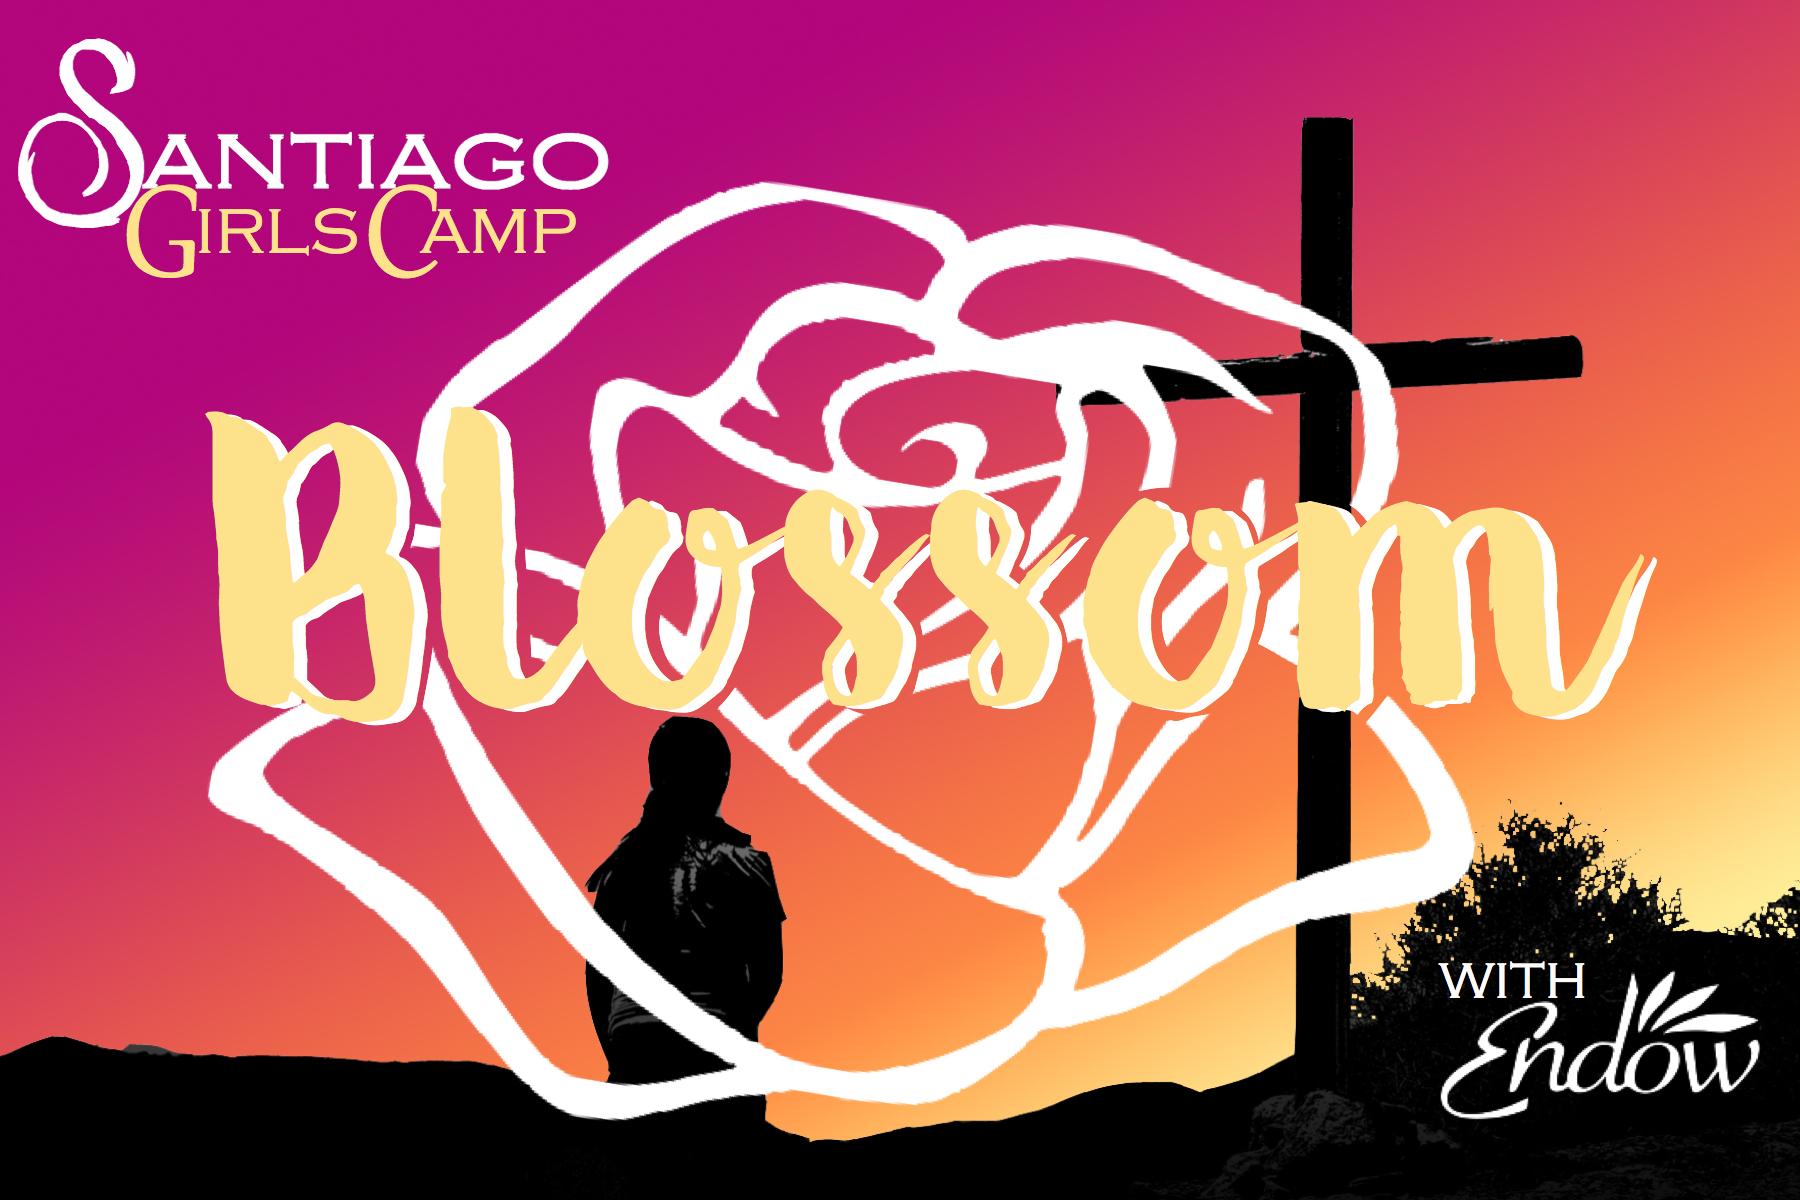 Santiago Girls Camp 2017